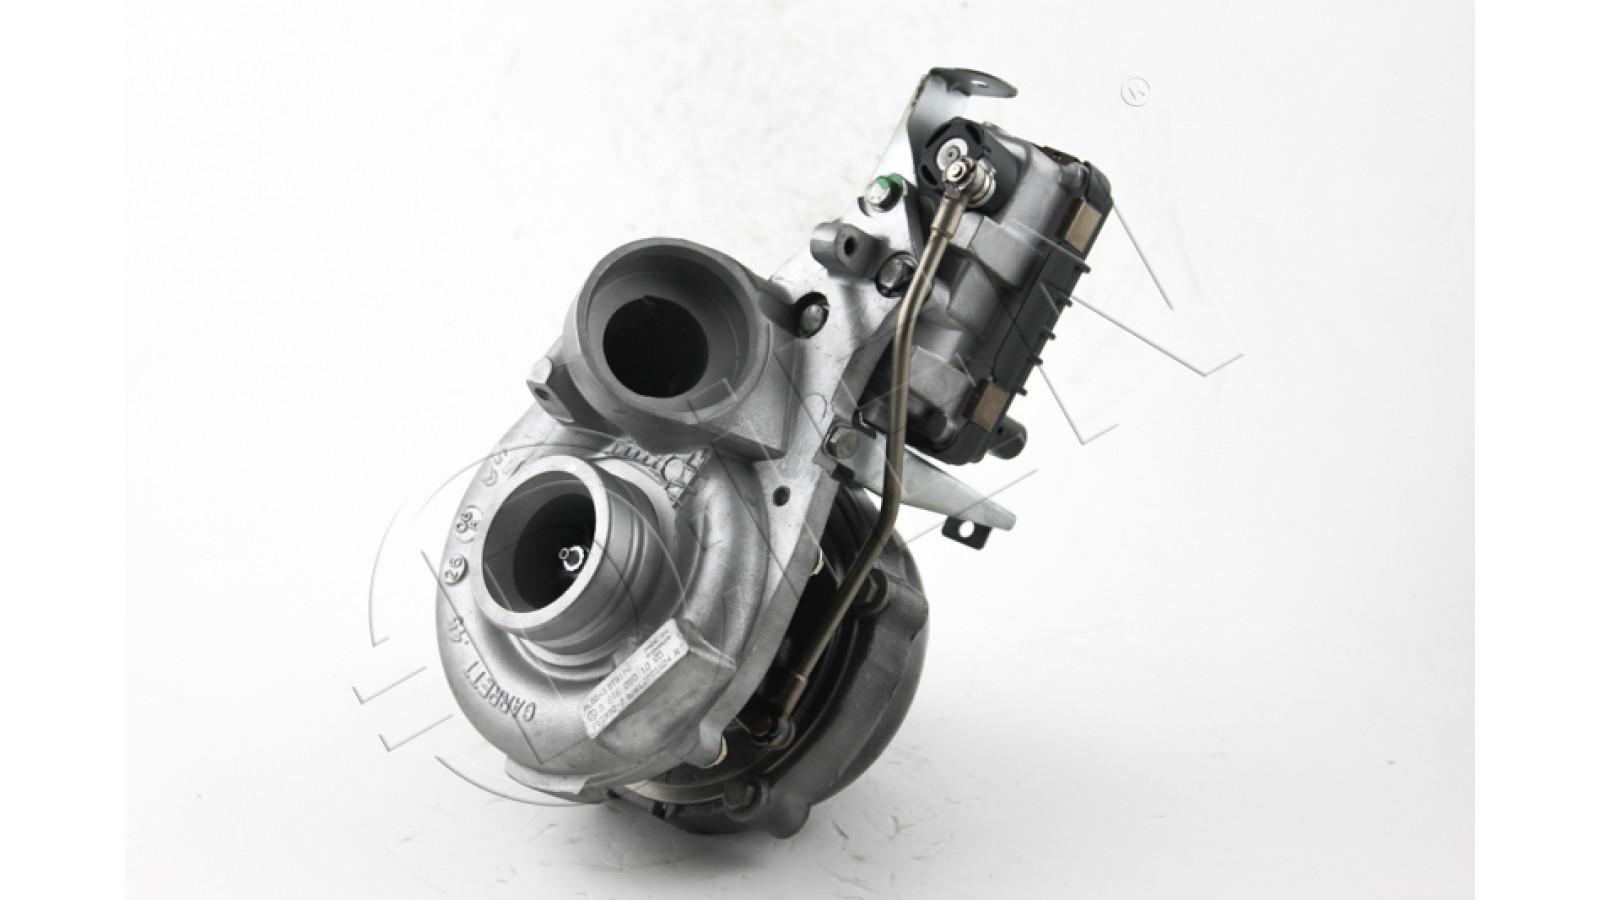 turbina mercedes c-klasse 200 cdi  w204  136 cv